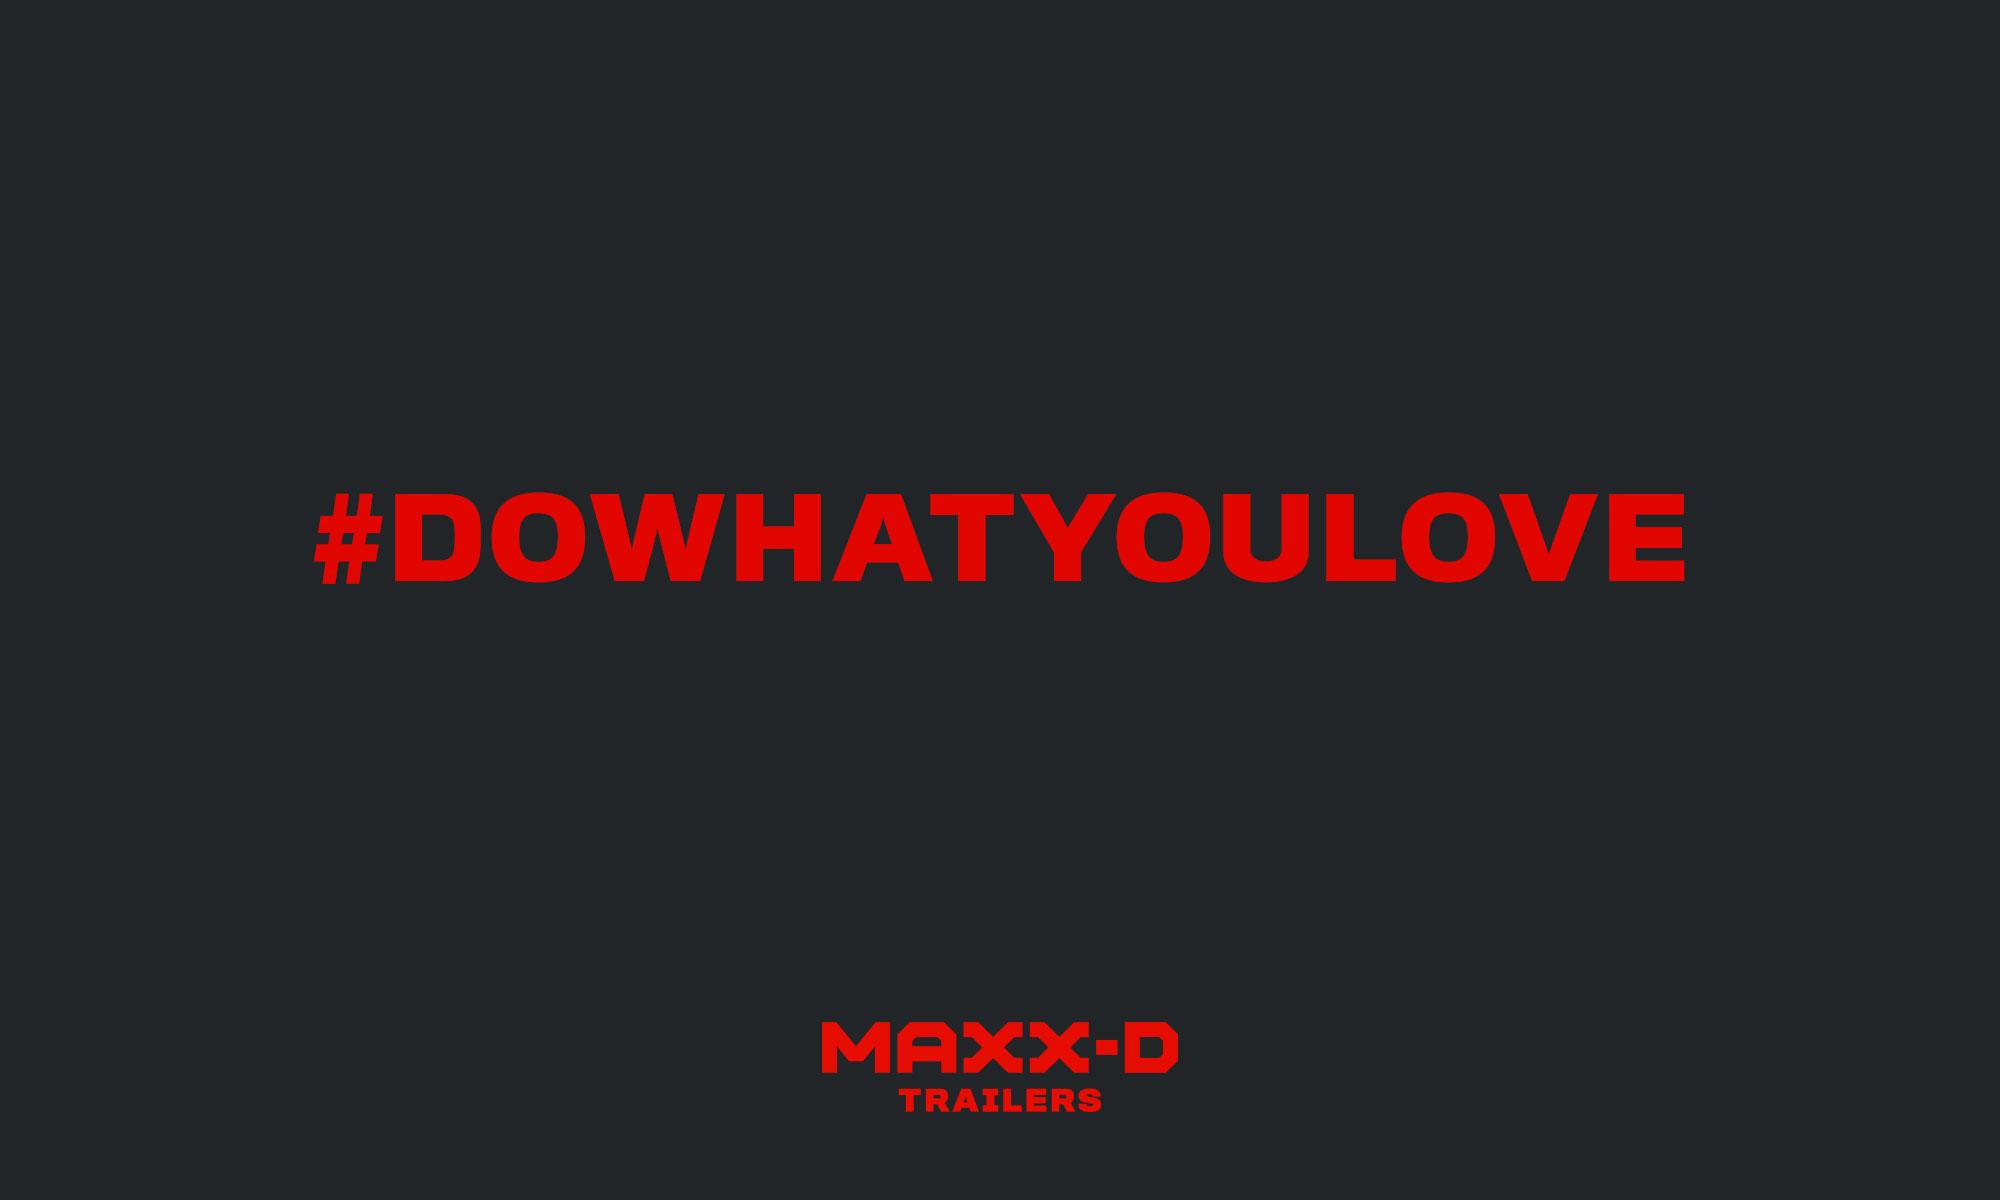 maxx-d trailers branding